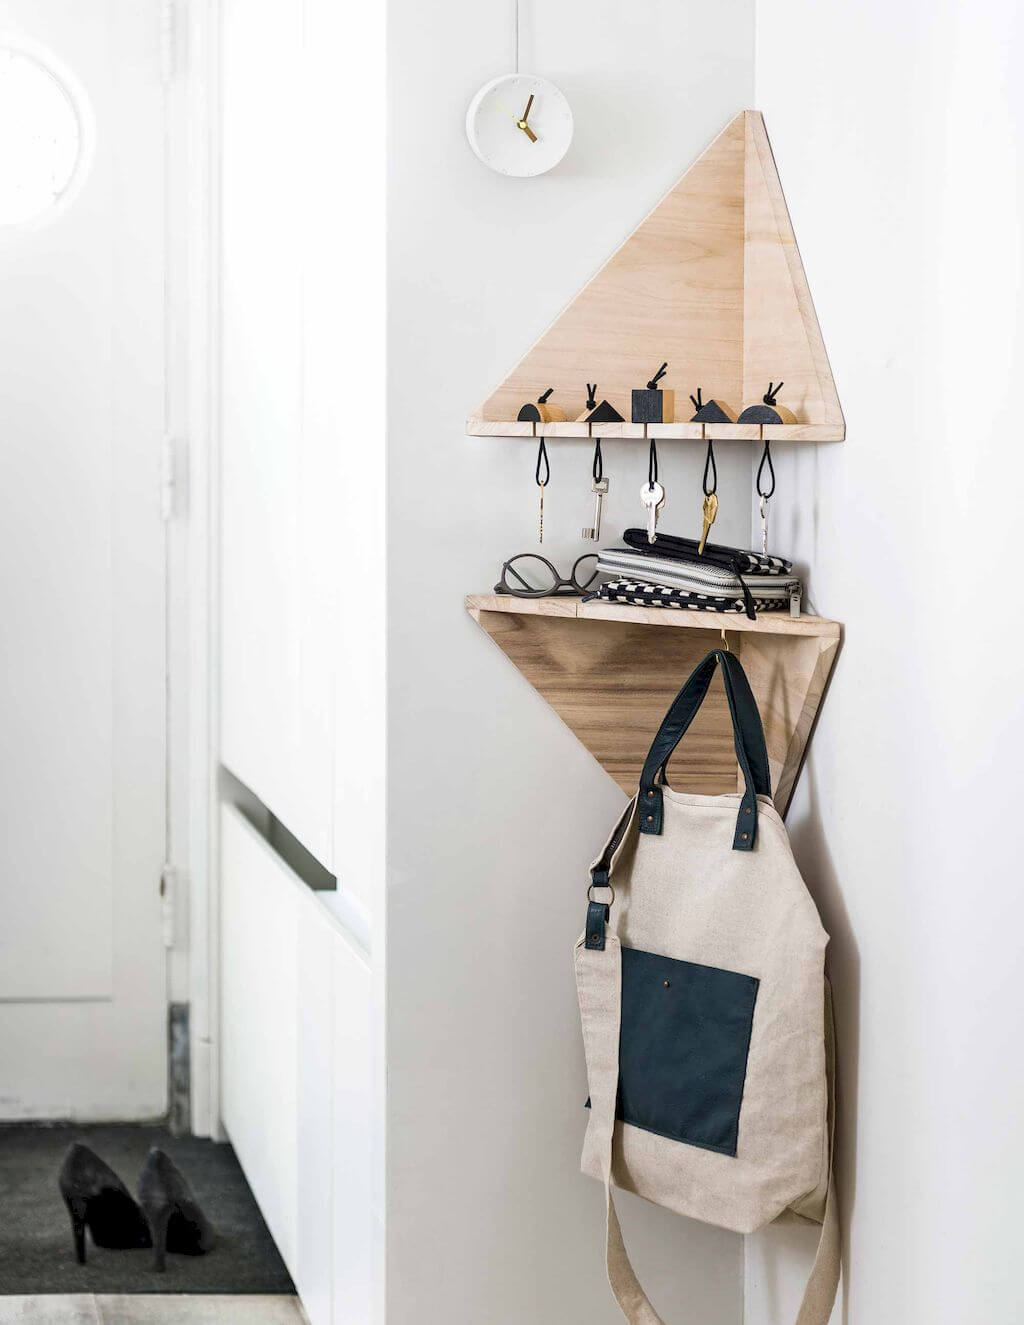 Ingenious Triangular Shelf for Keys